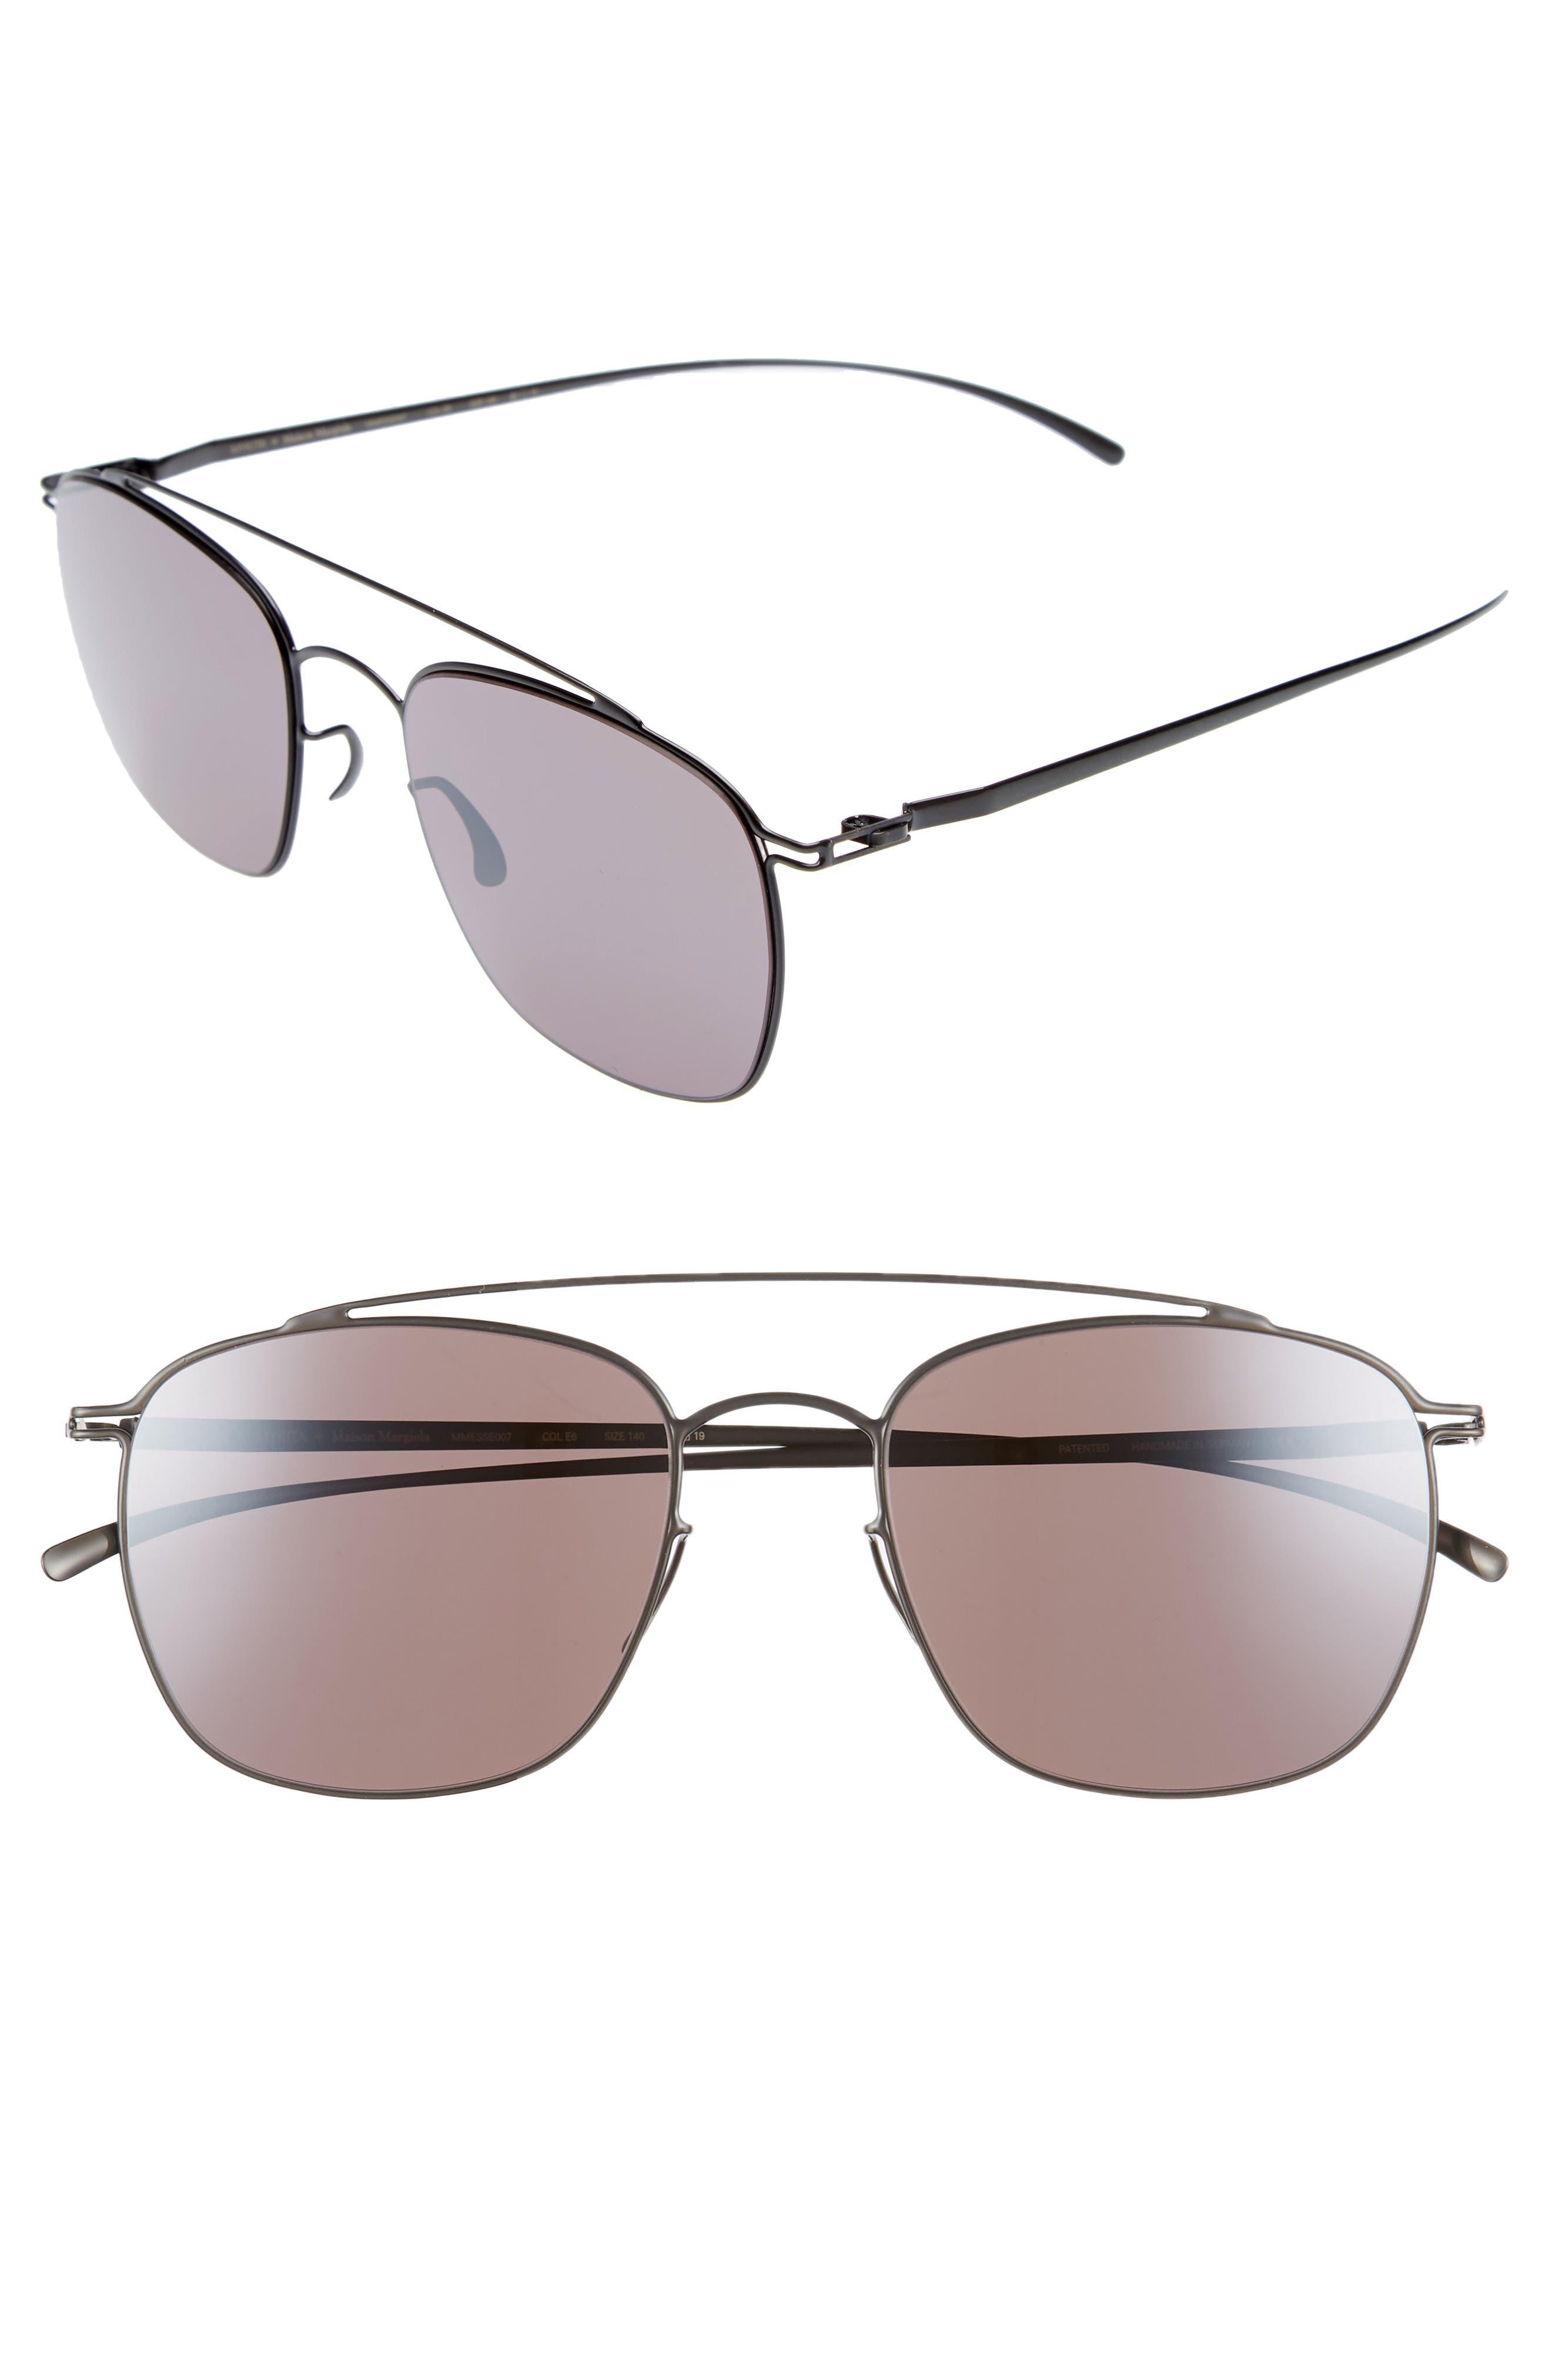 MMESSE007 51mm Aviator Sunglasses,                         Main,                         color,